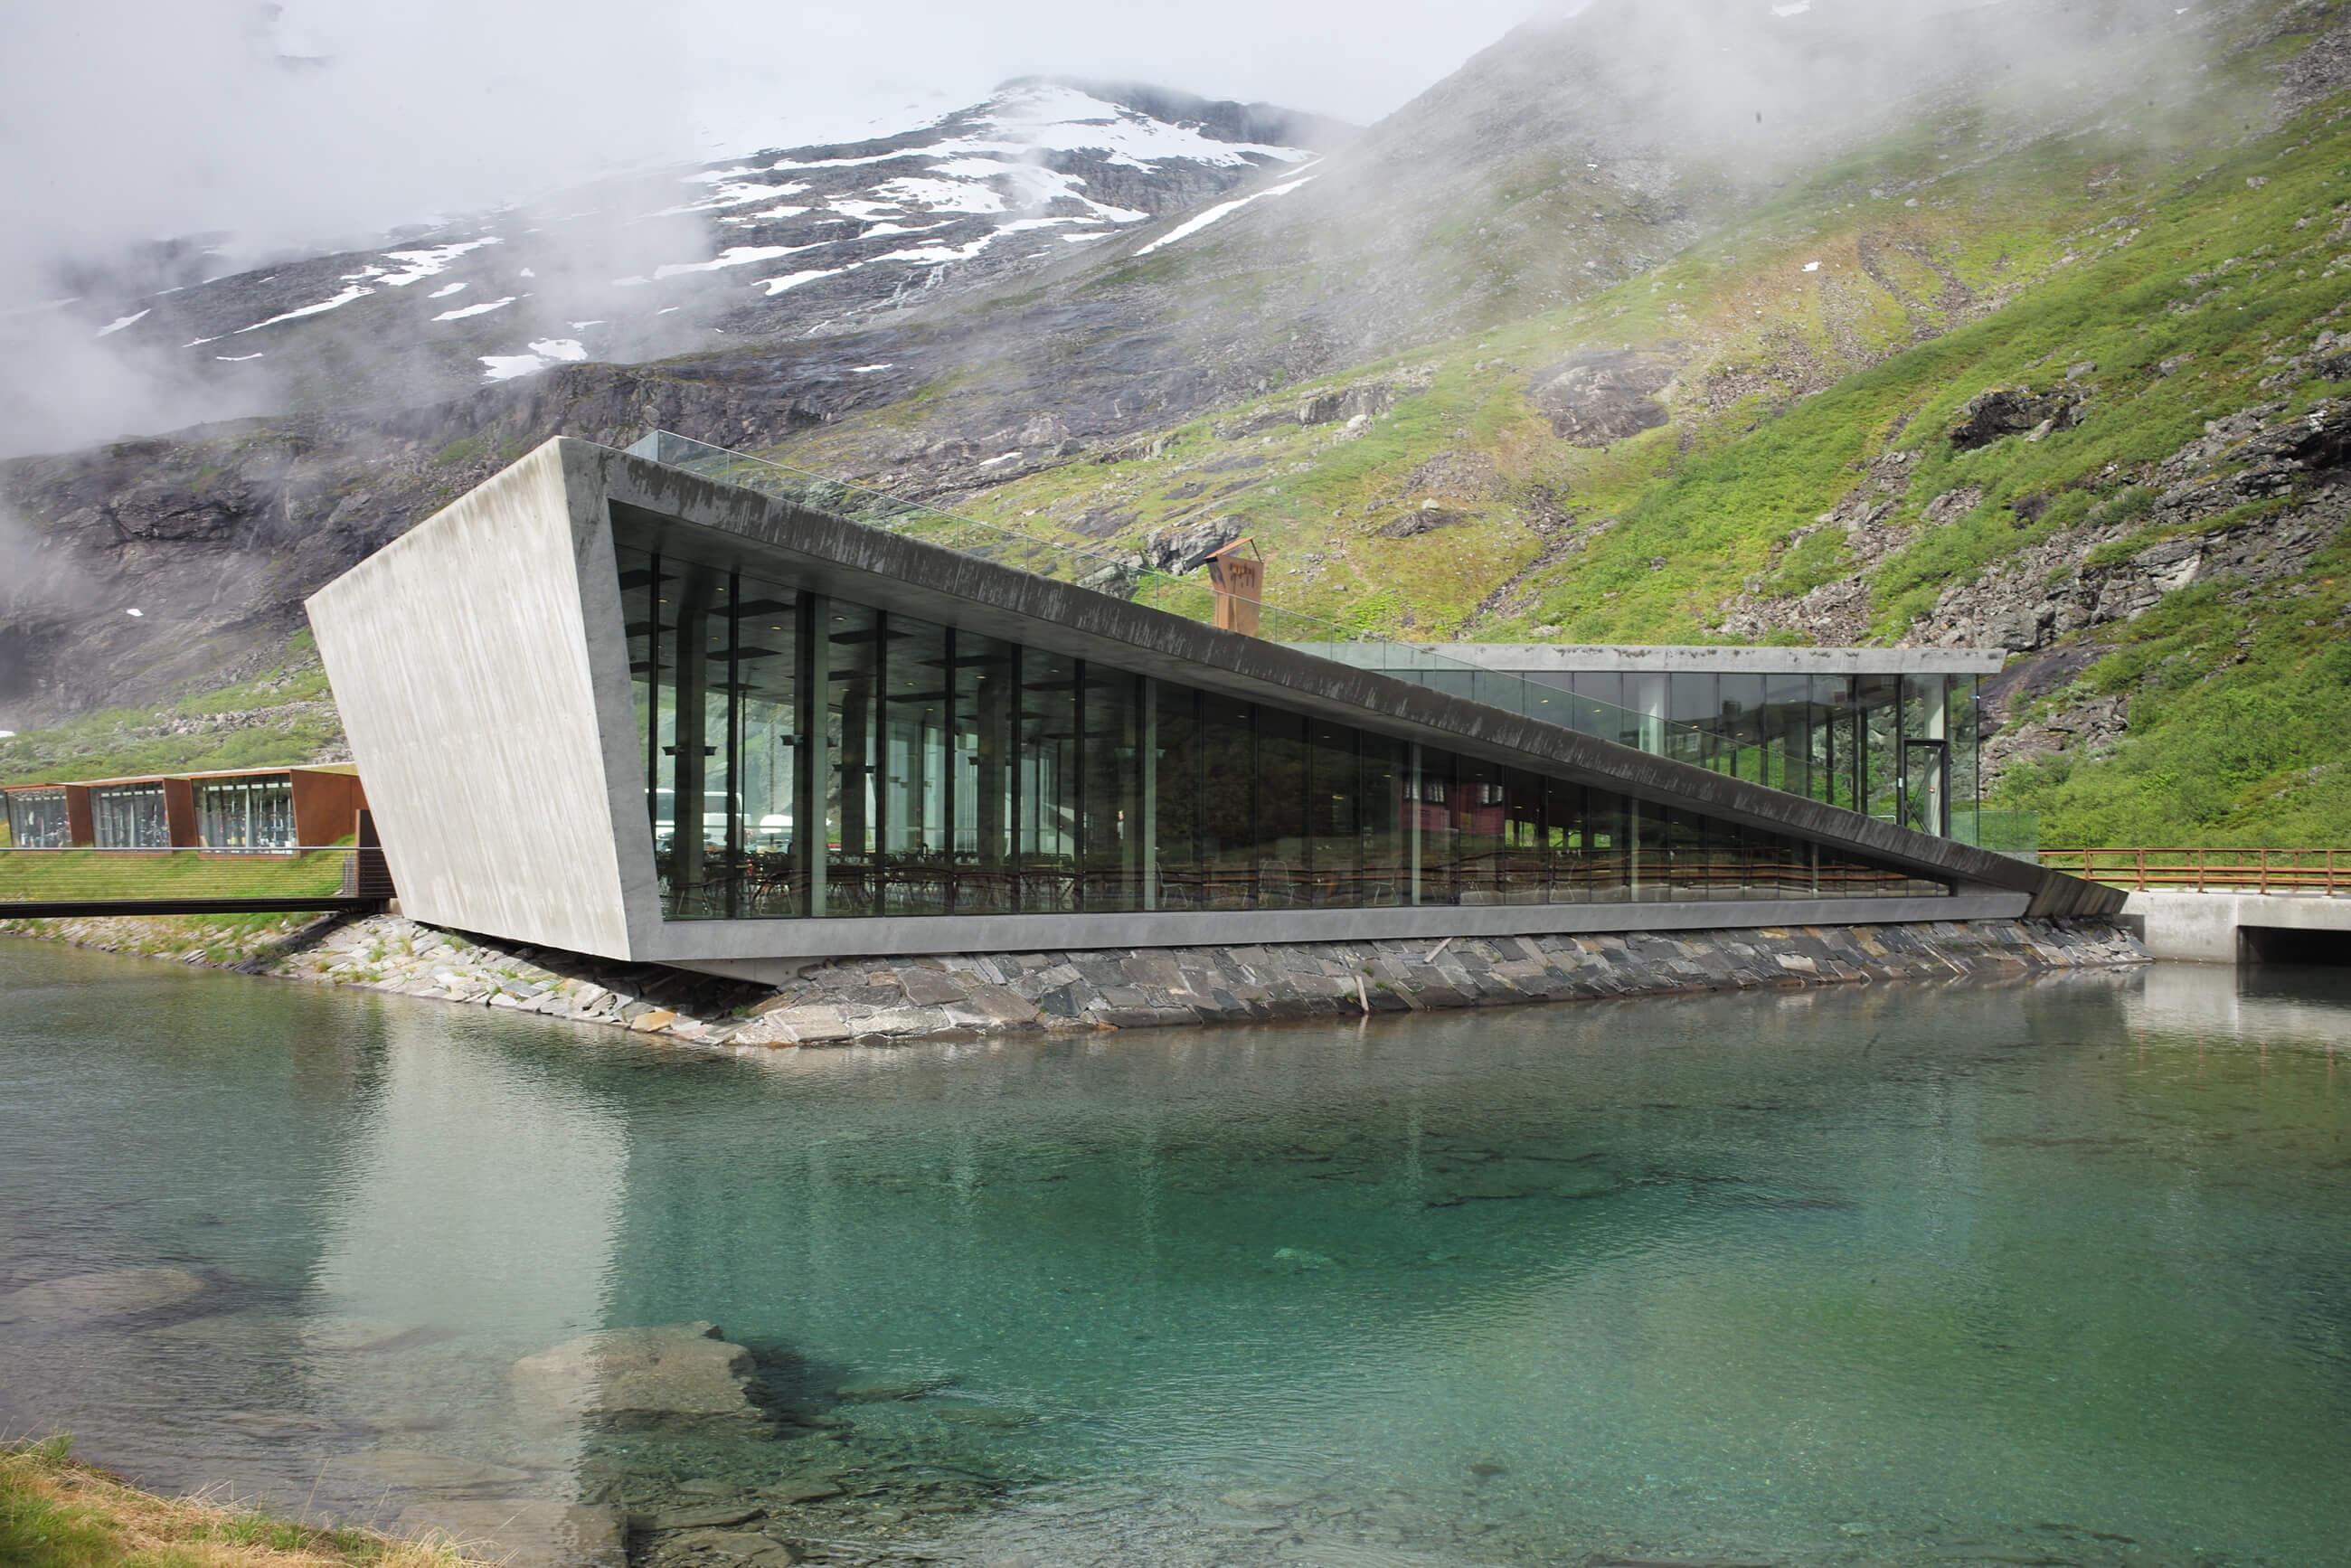 https://bubo.sk/uploads/galleries/5039/lubosfellner_norsko_skandinavialaponsko_family_l1002217-1-.jpg